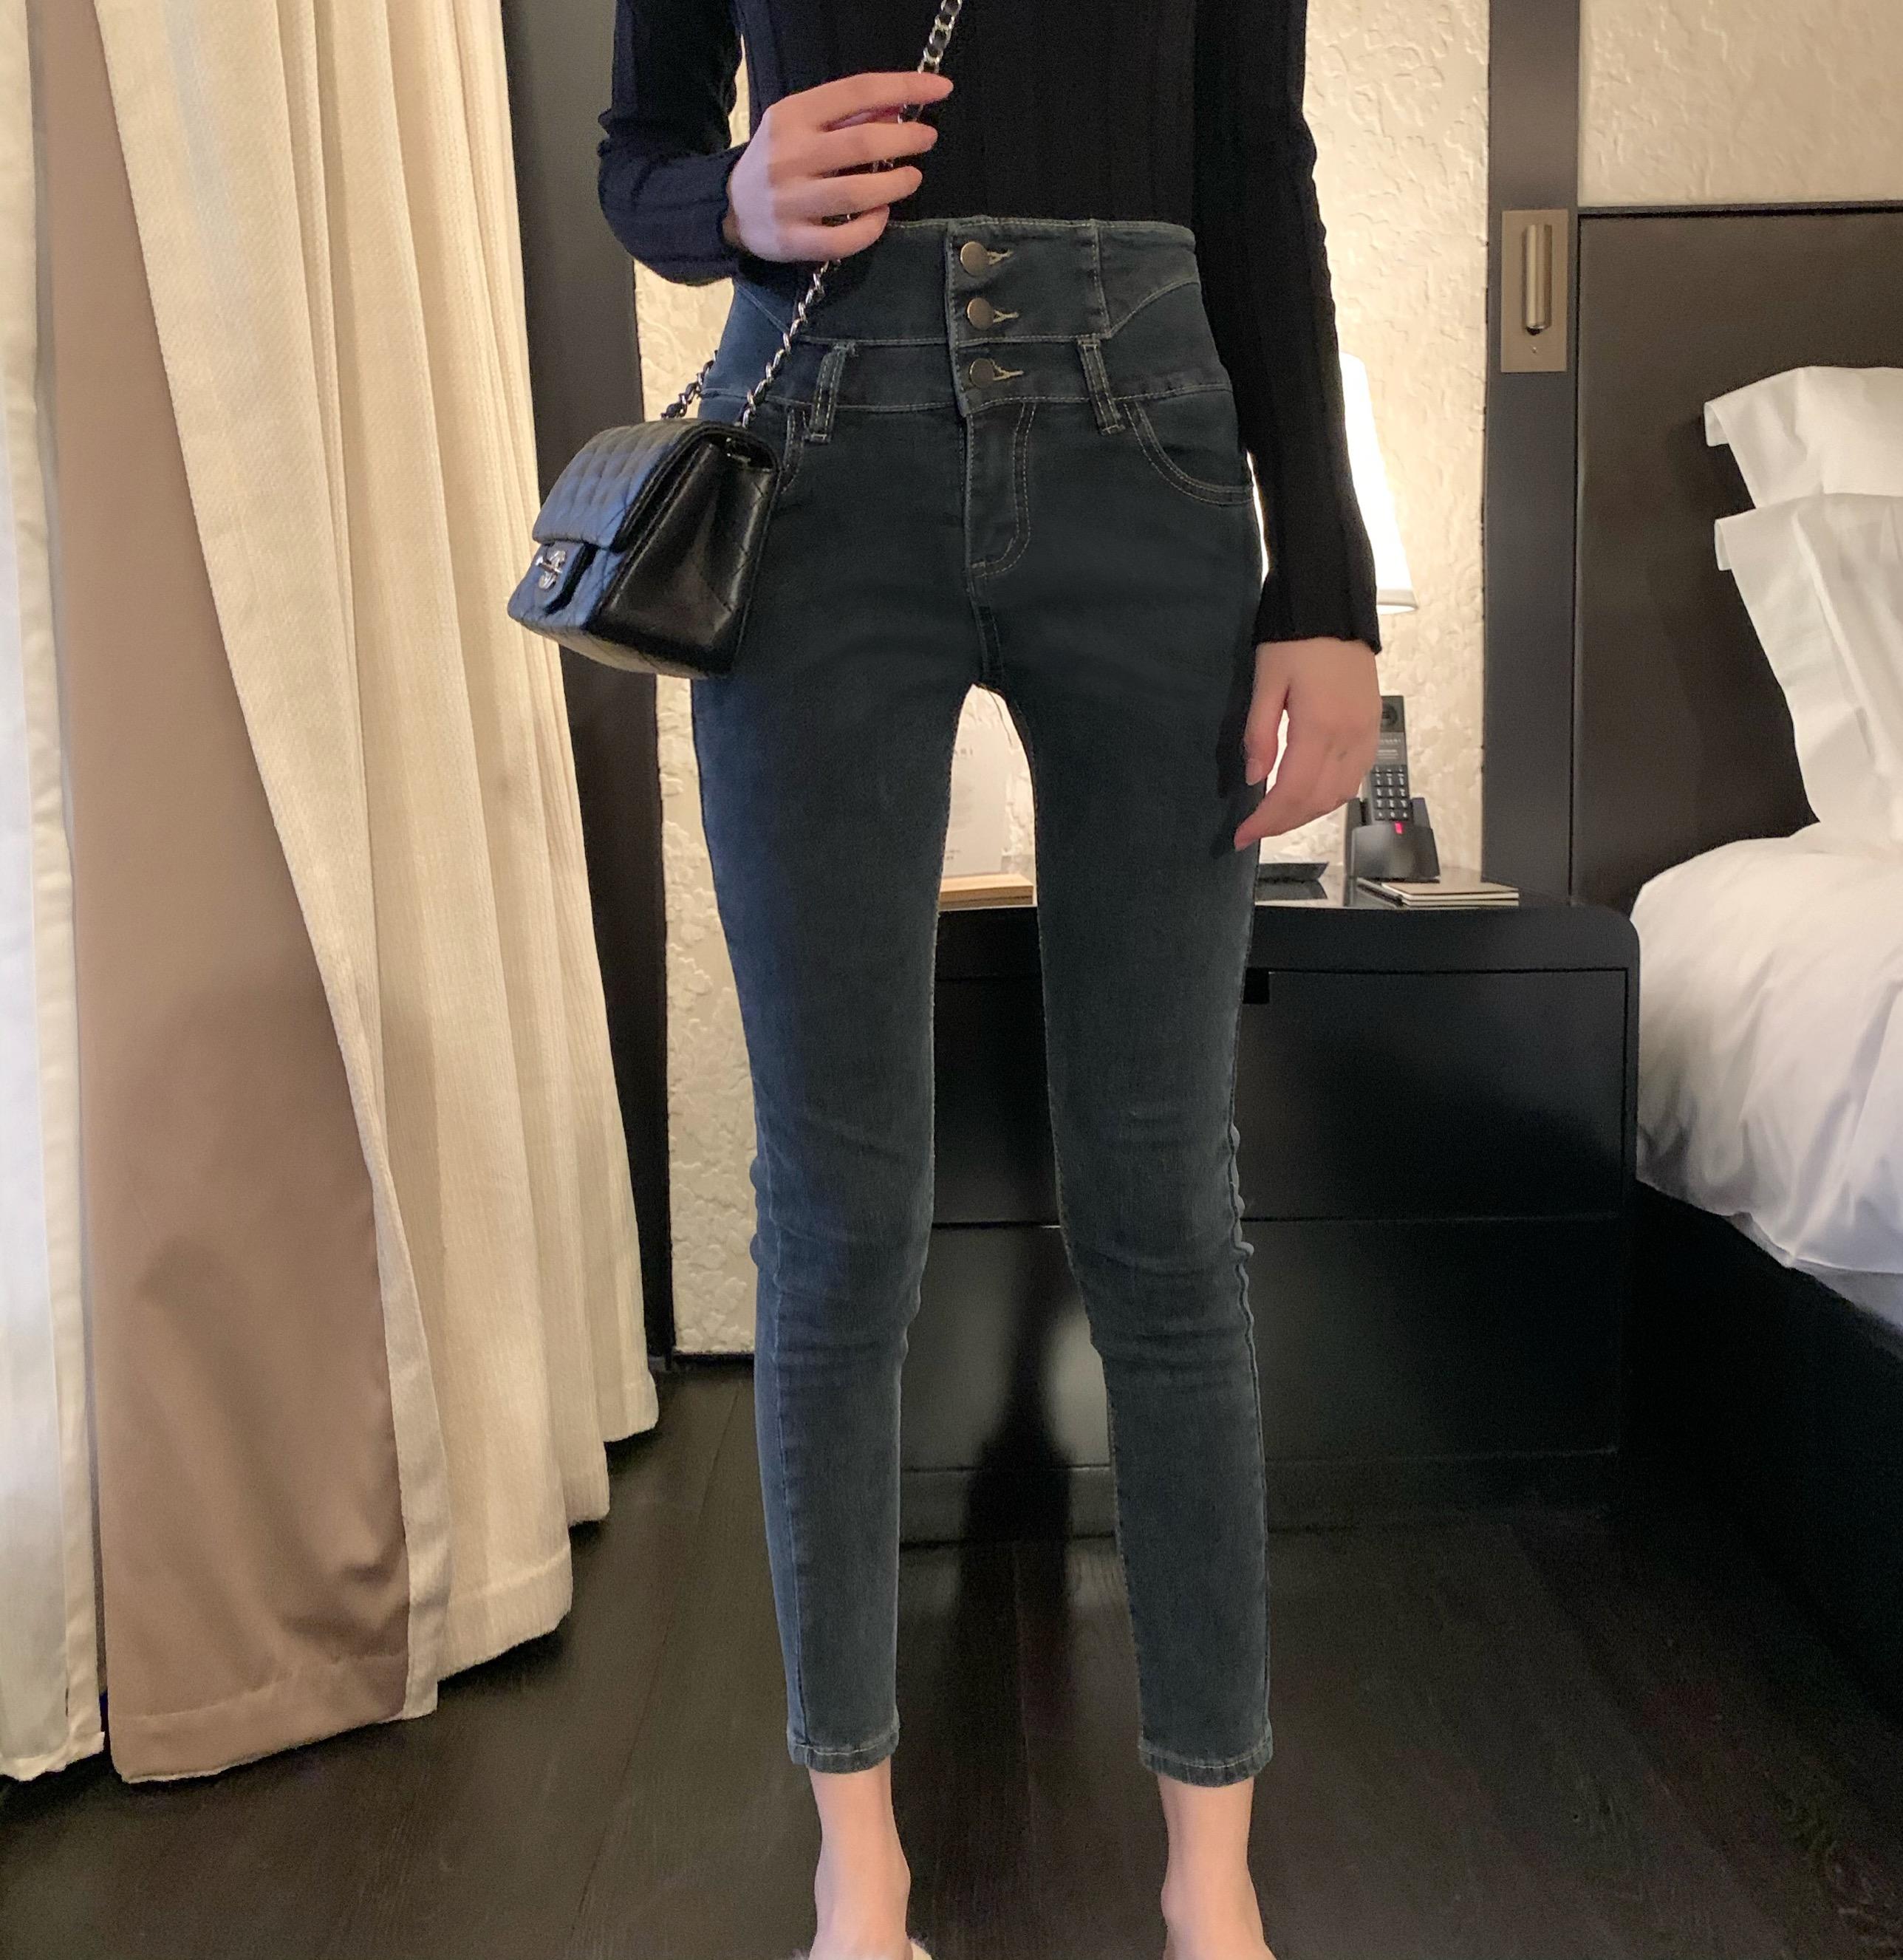 Sweetheart 穿出漫画腿 冬季显高显瘦腿长4米高腰牛仔裤铅笔裤女